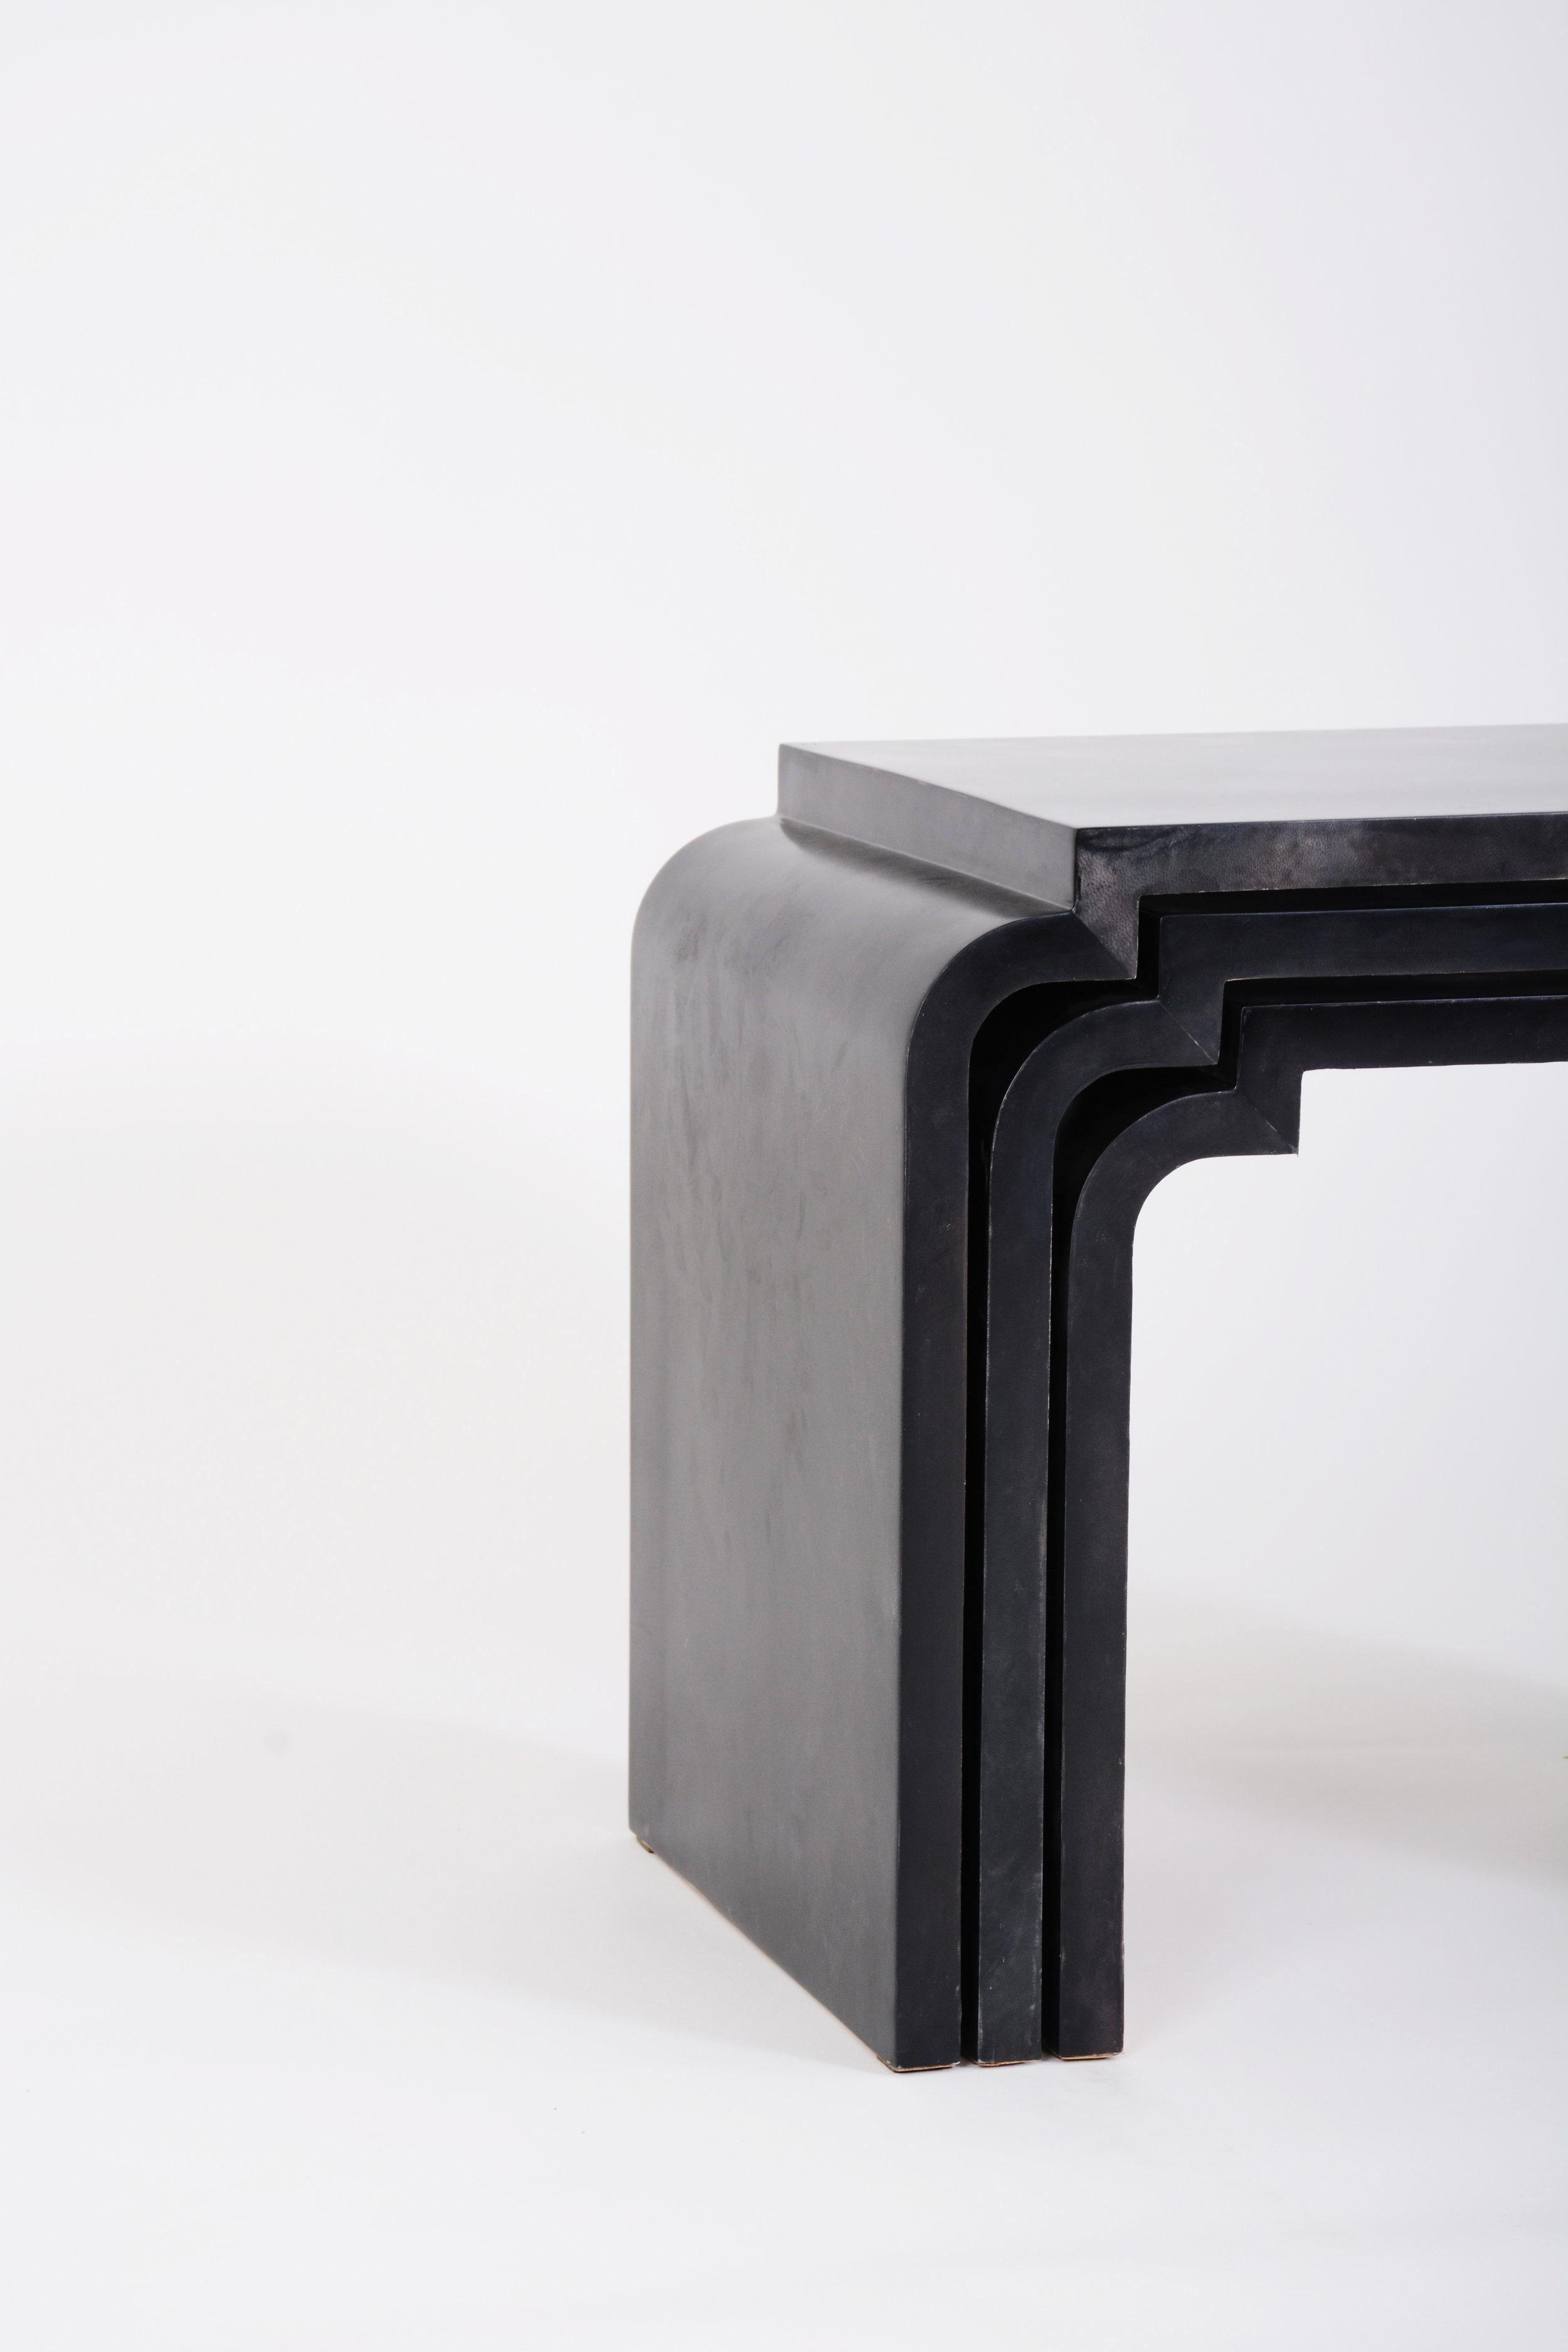 yuu nesting tables 2.JPG